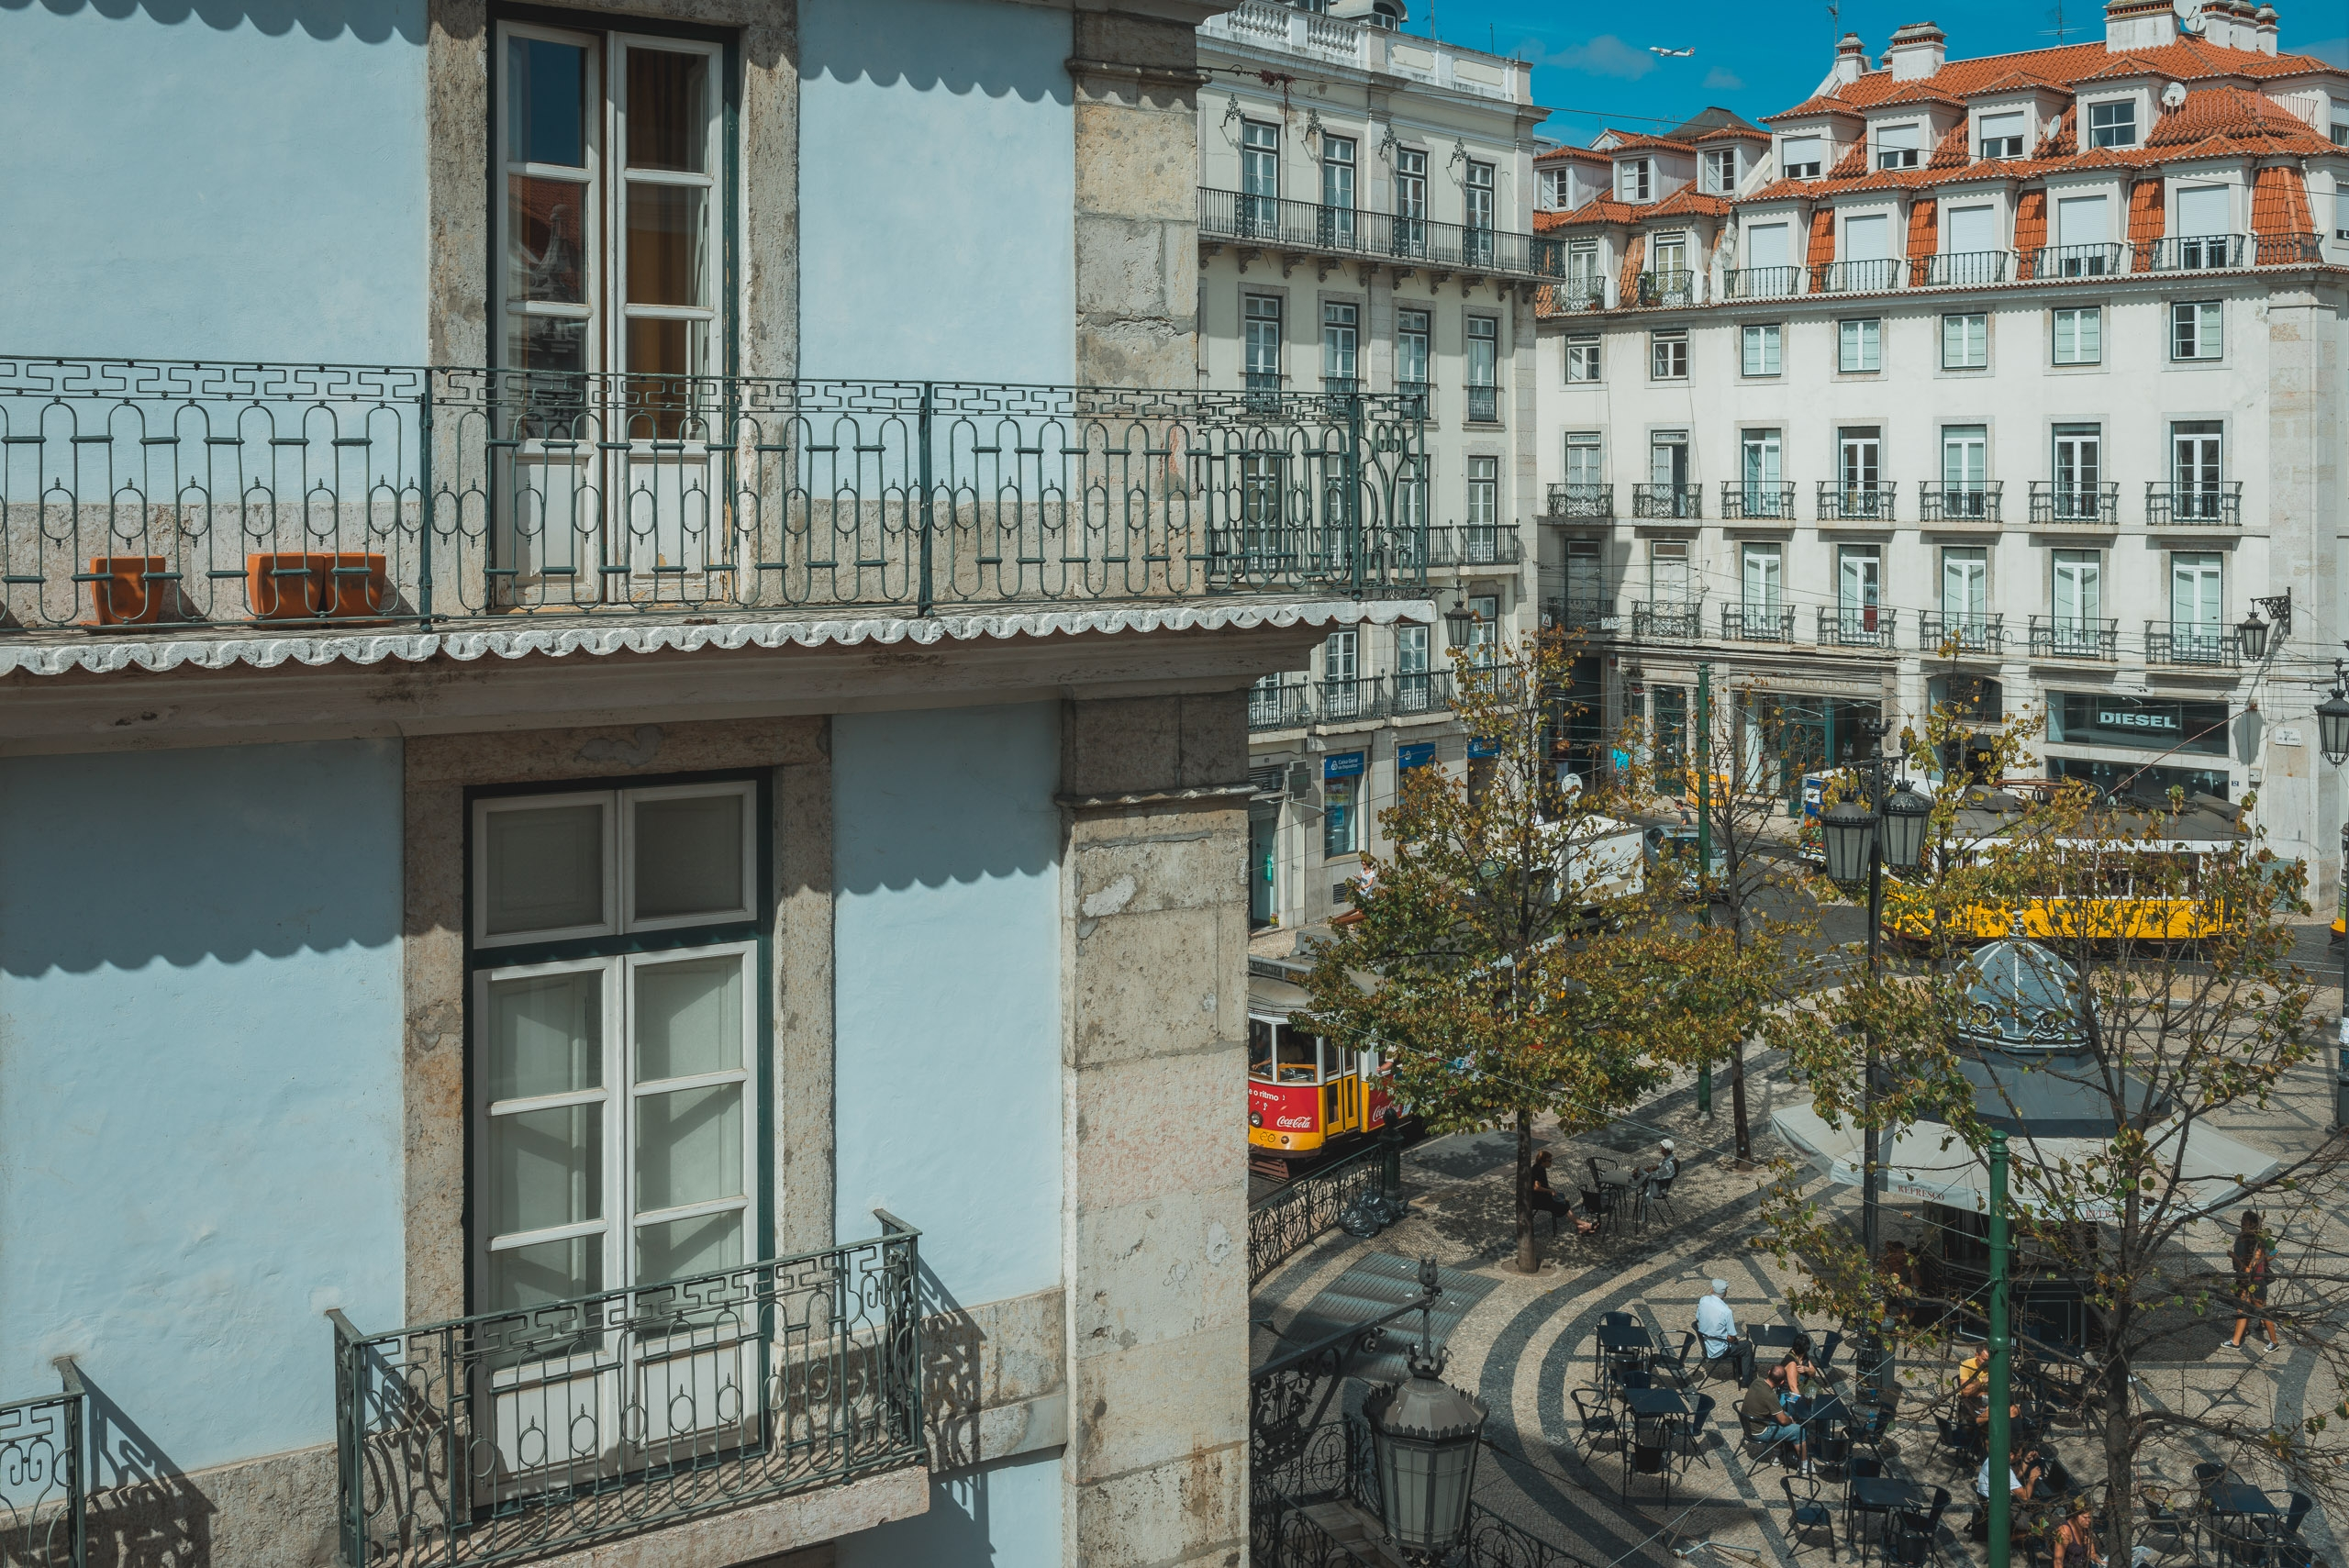 Portugal - Lisbon - 2012-0921-DSC_1327